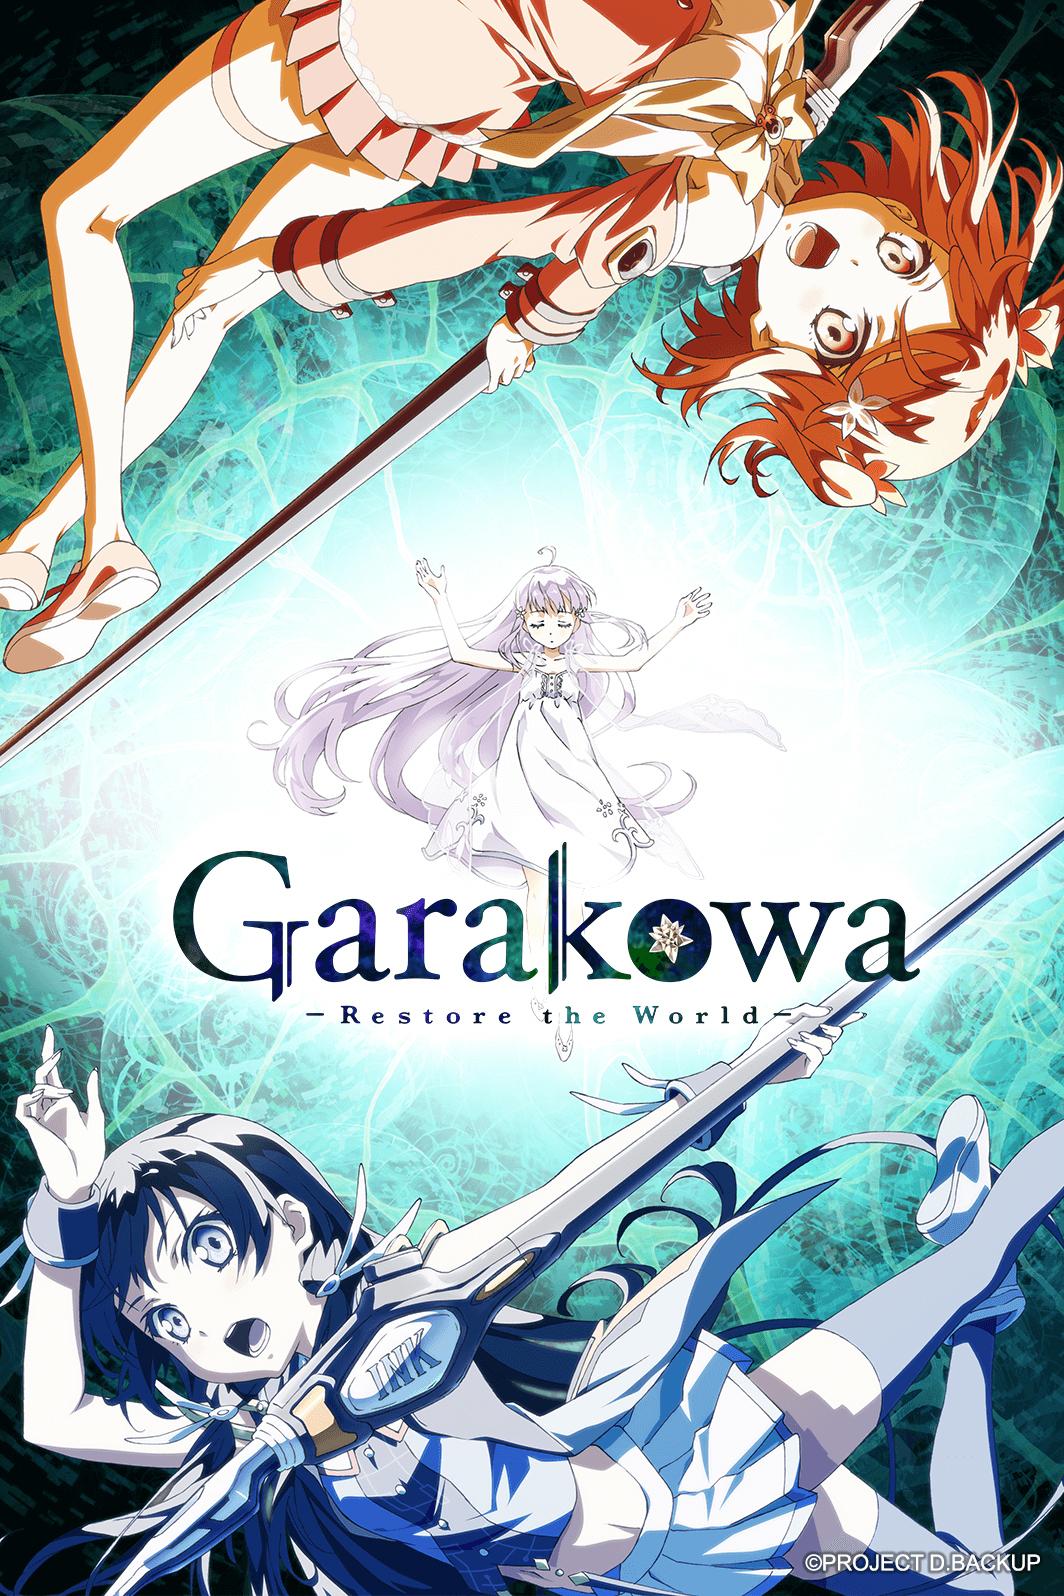 Garakowa -Restore the World-